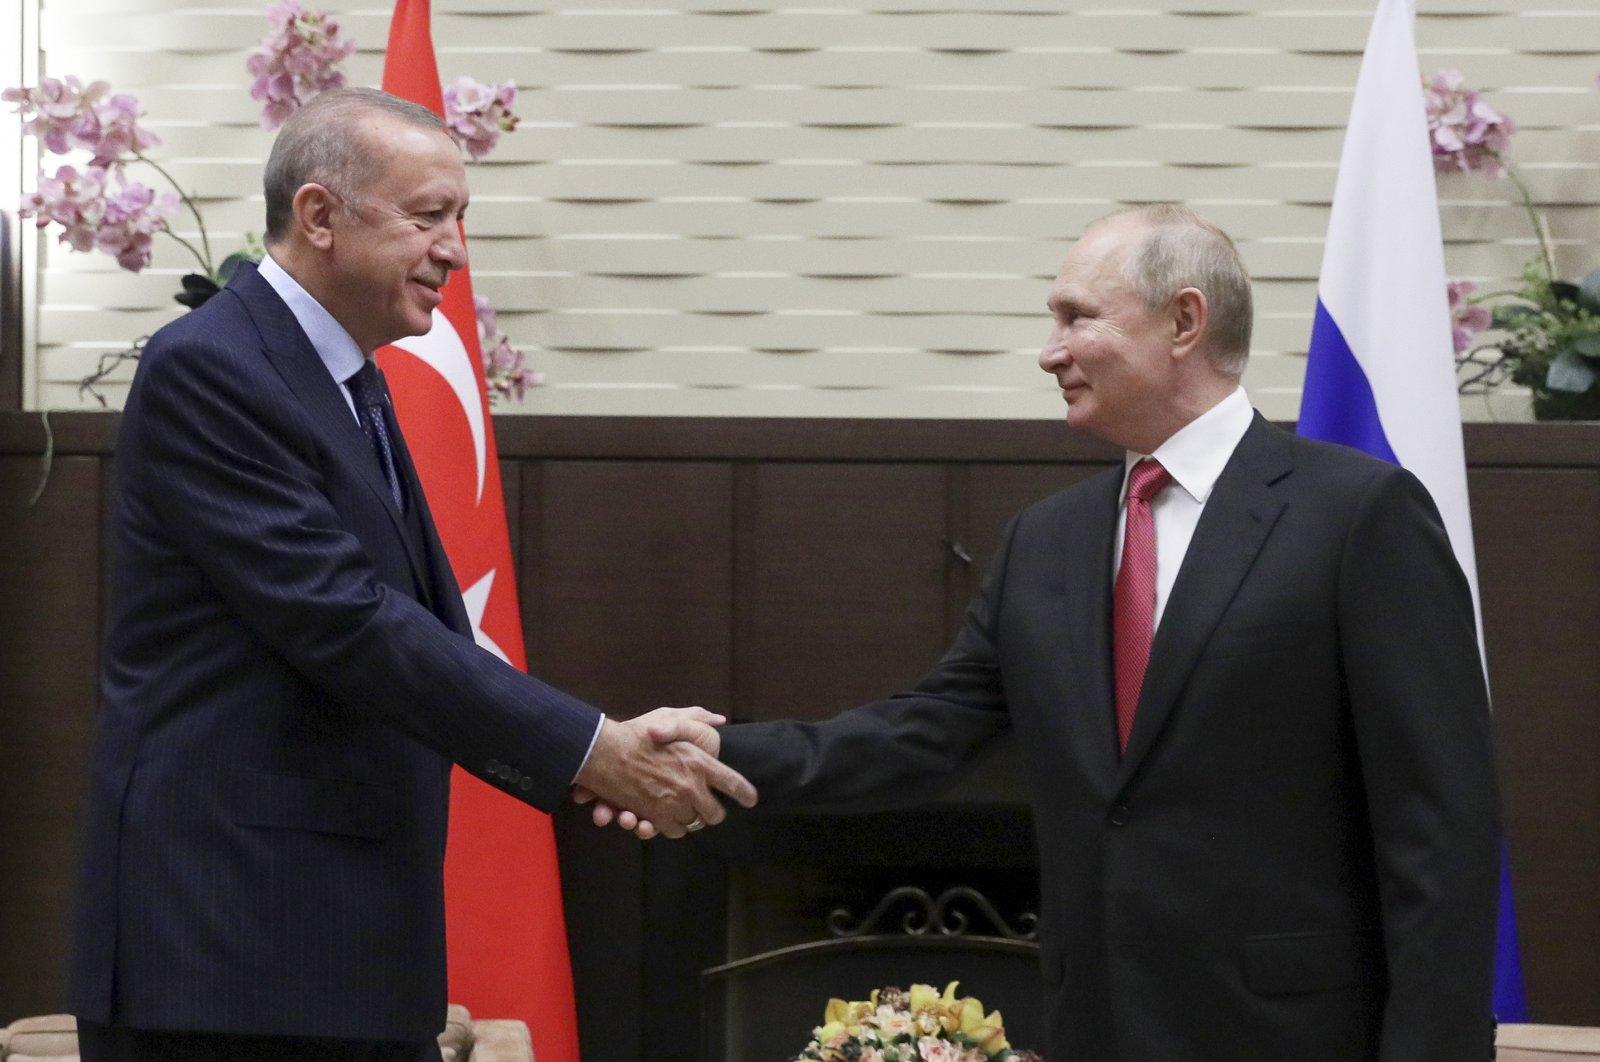 President Recep Tayyip Erdoğan (L) and Russian President Vladimir Putin shake hands during their meeting in the Bocharov Ruchei residence in the Black Sea resort of Sochi, Russia, Sept. 29, 2021. (AP Photo)